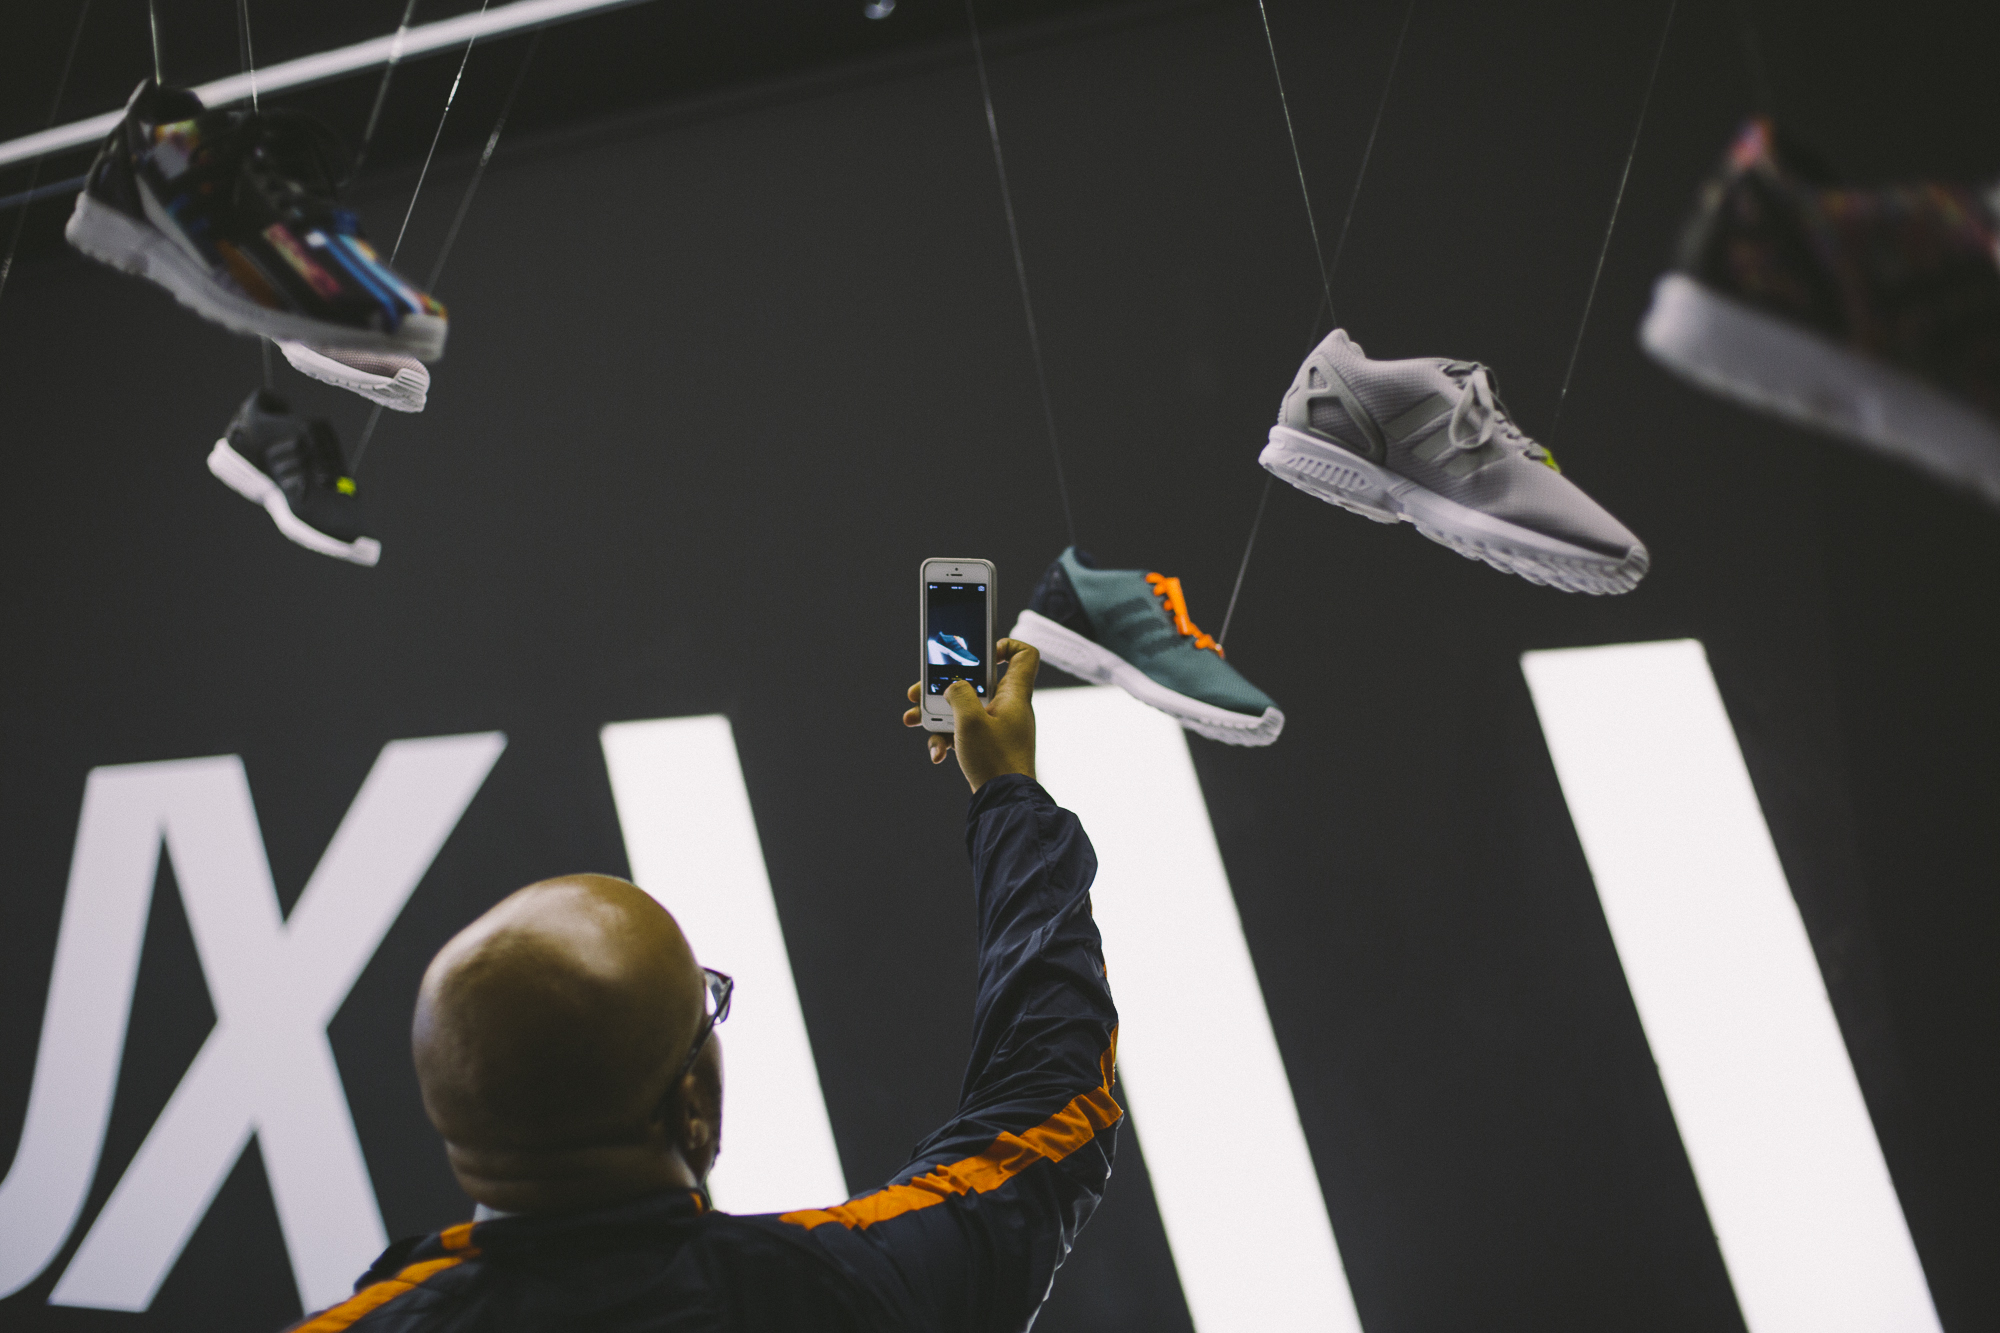 47_Adidas_ZX Flux_KimTerriSmith.jpg